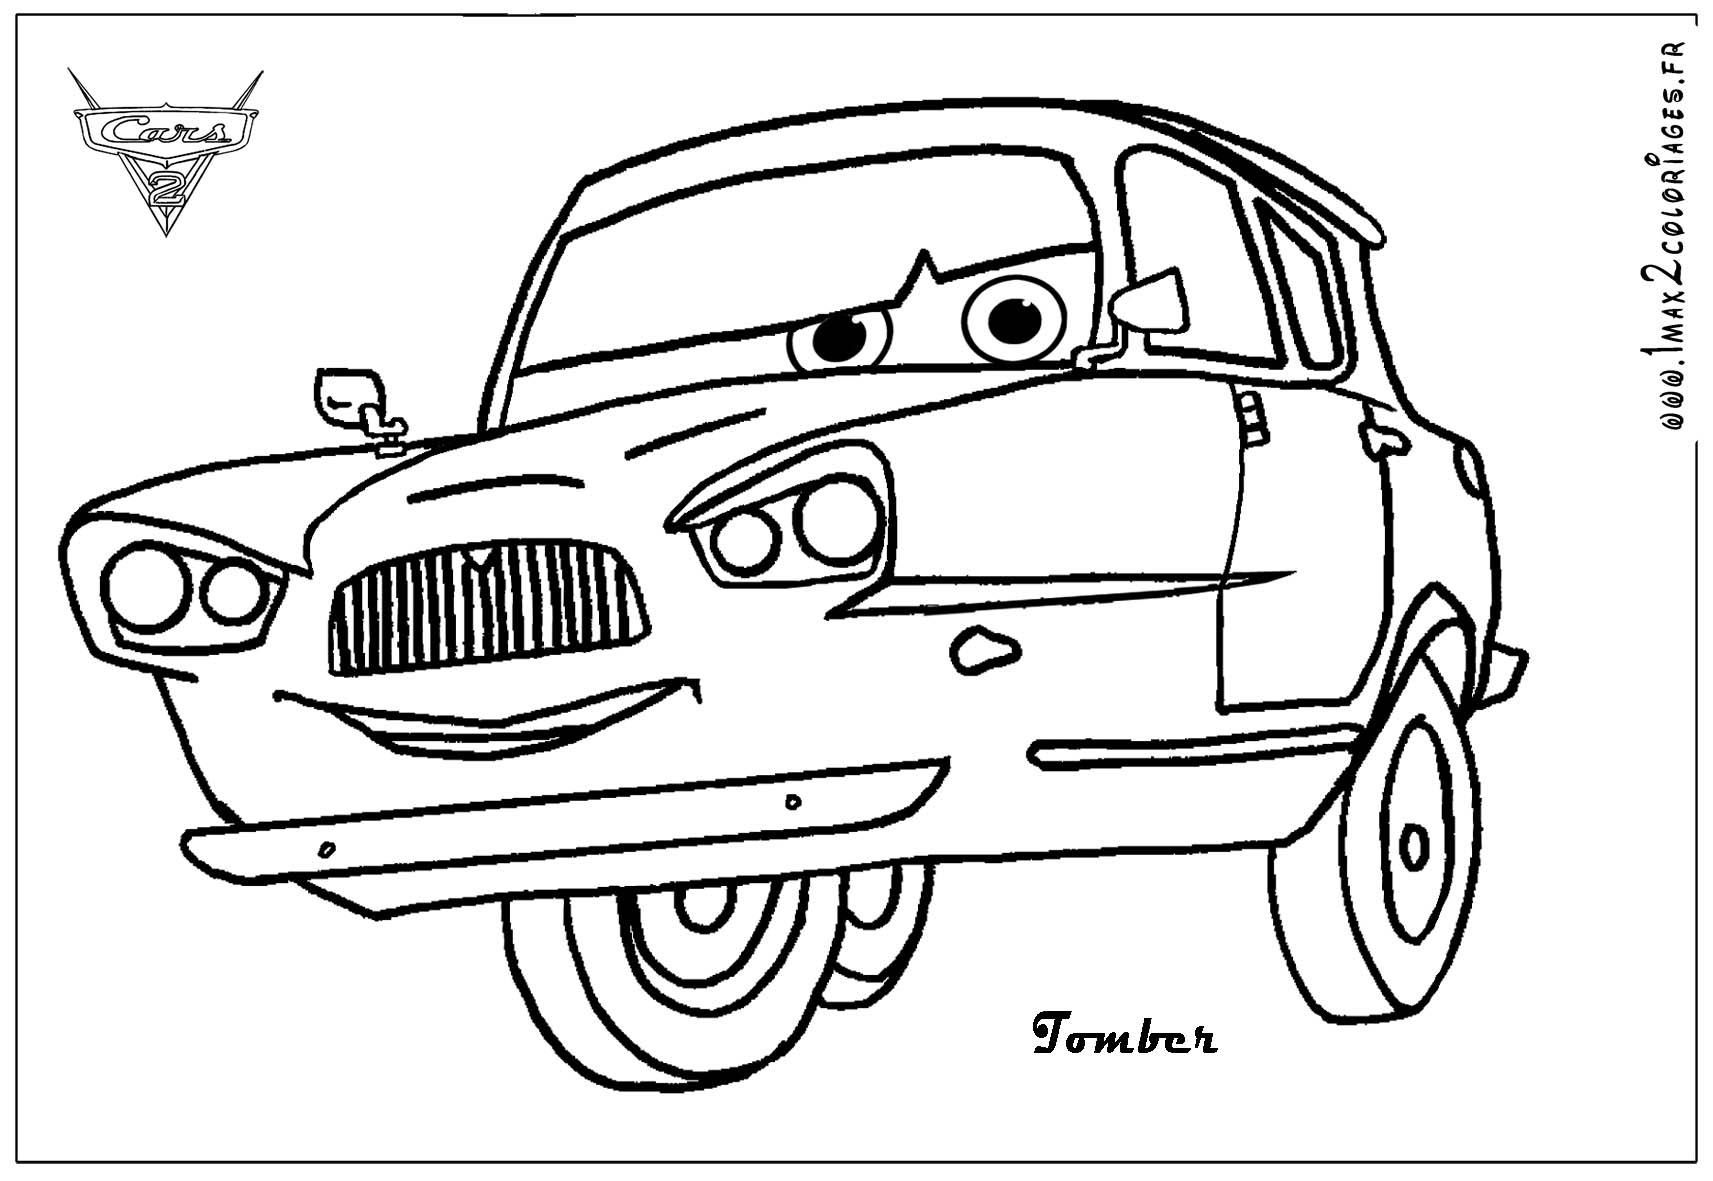 Coloriages cars 2 tomber cars 2 coloriages les bagnoles 2 - Cars 2 coloriage ...